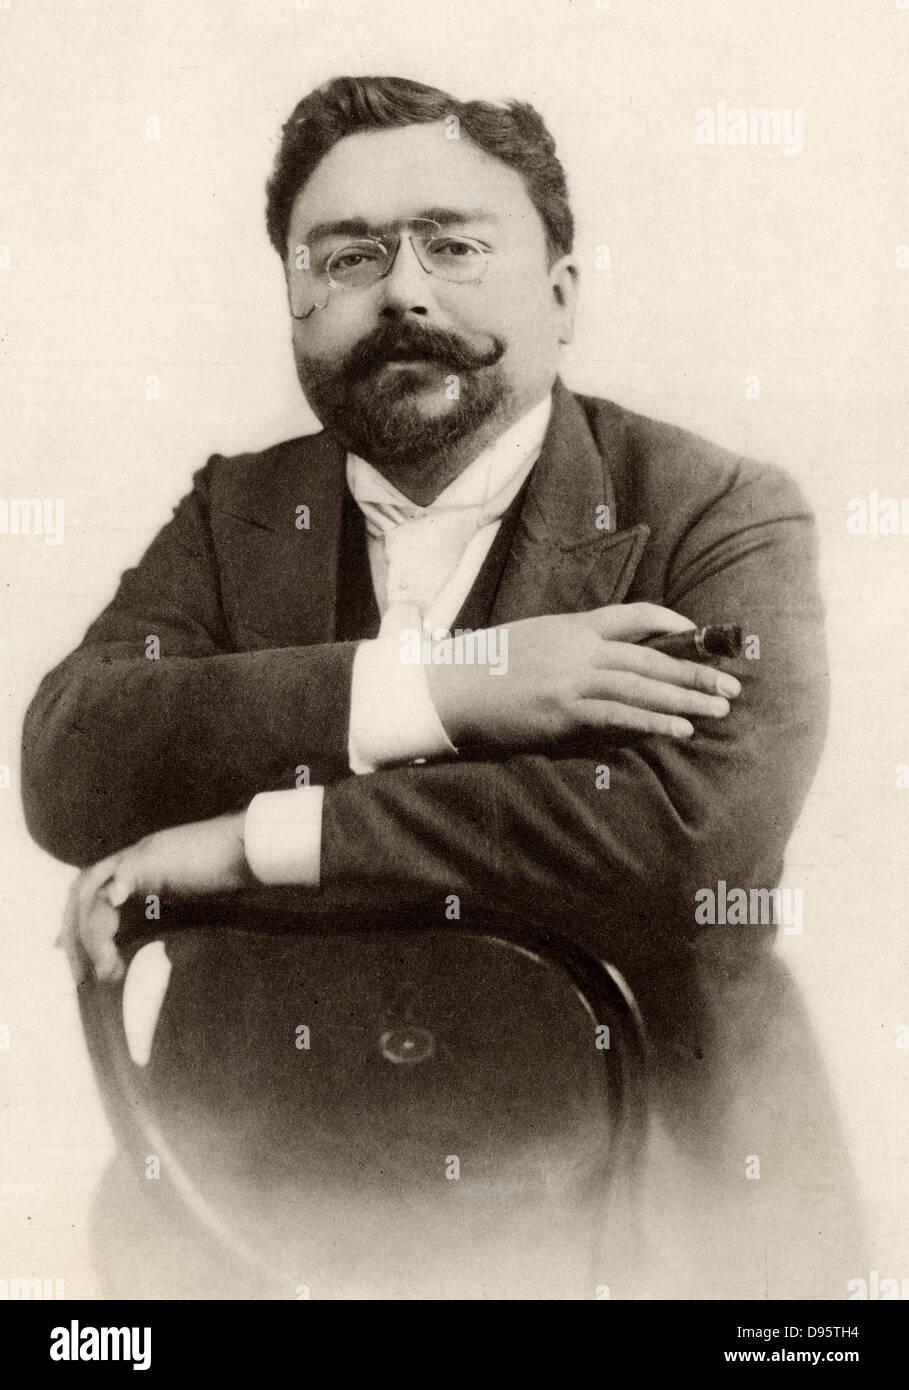 Isaac (Manuel Francisco) Albeniz (1860-1909) Spanish composer. - Stock Image